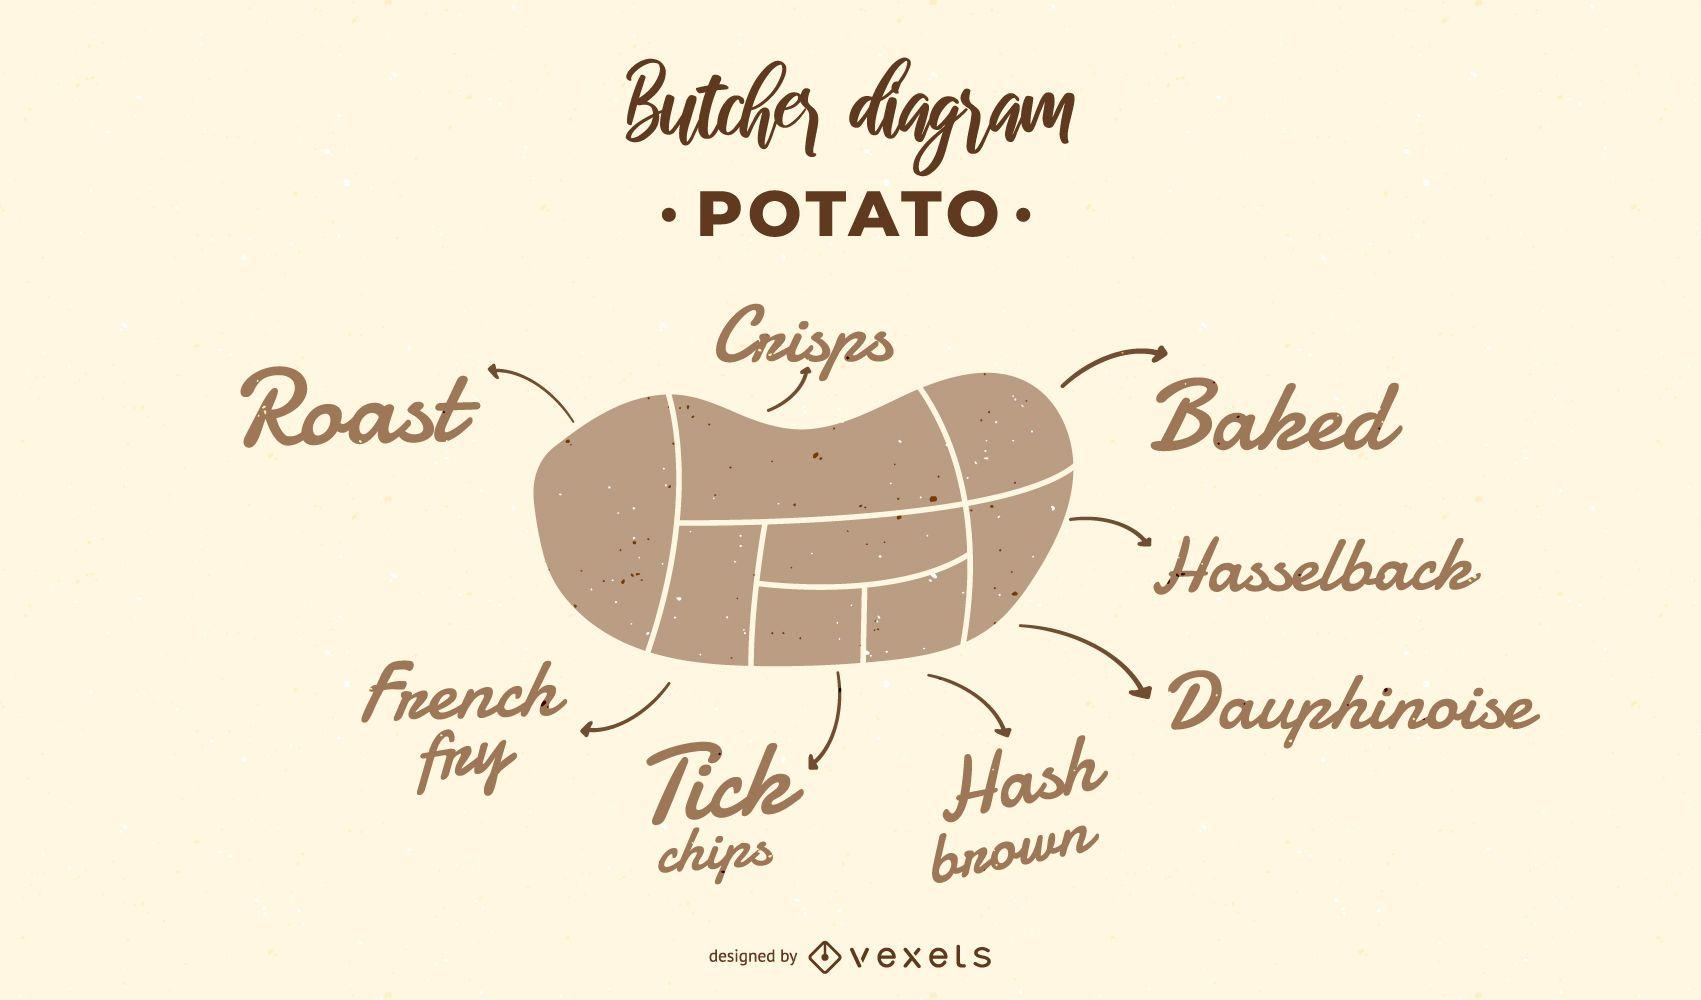 Potato Butcher Diagram Design